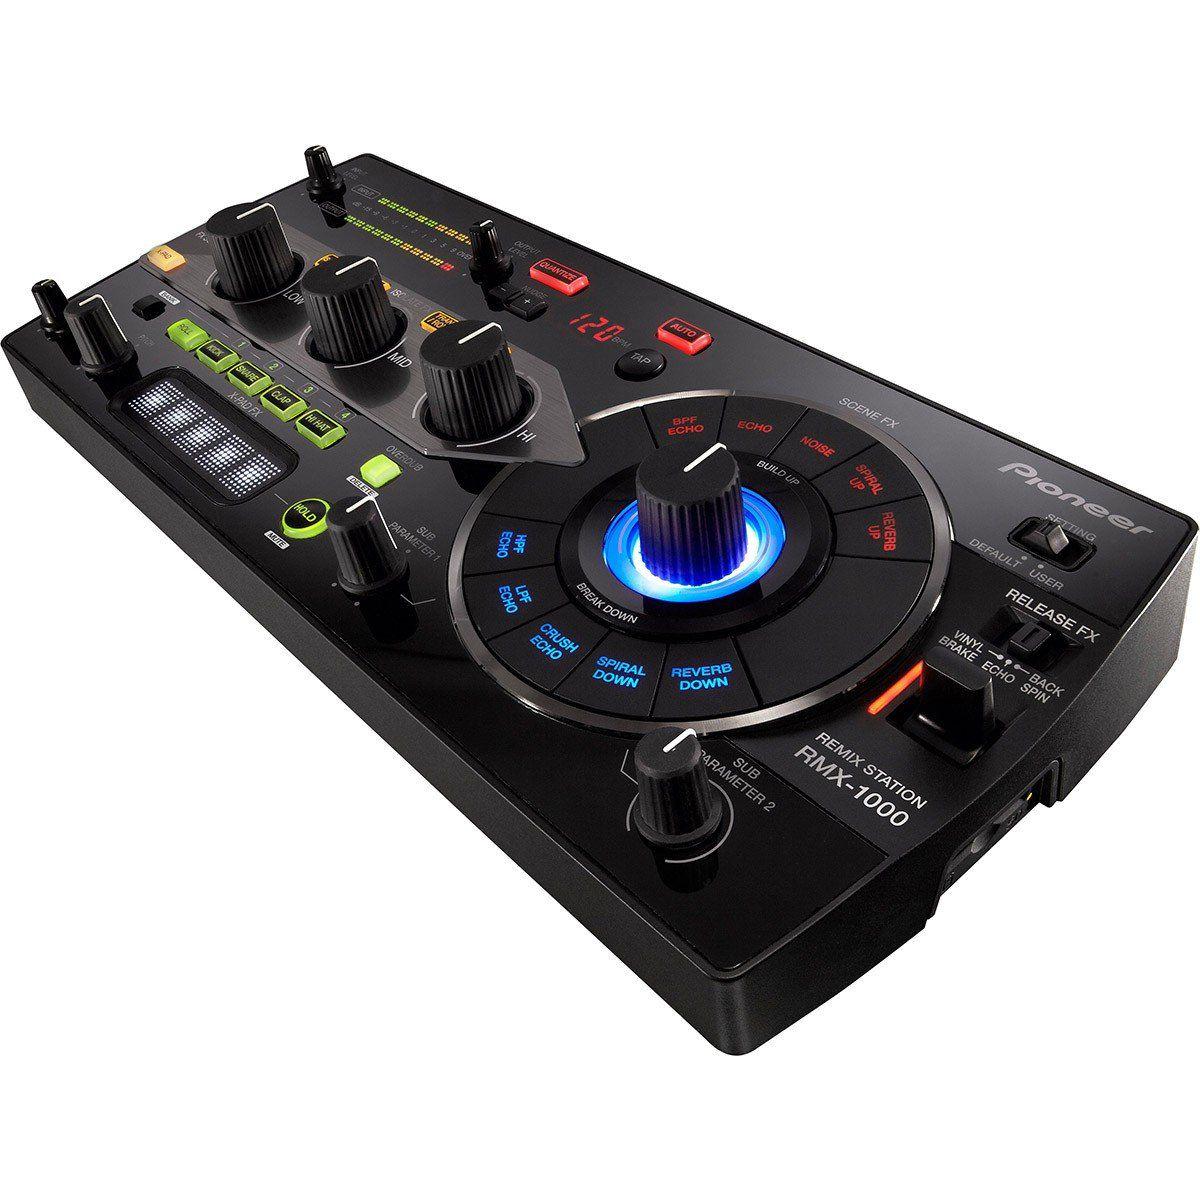 Pioneer RMX-1000 Remix Station Pioneer RMX 1000 de Efeitos Beatbox